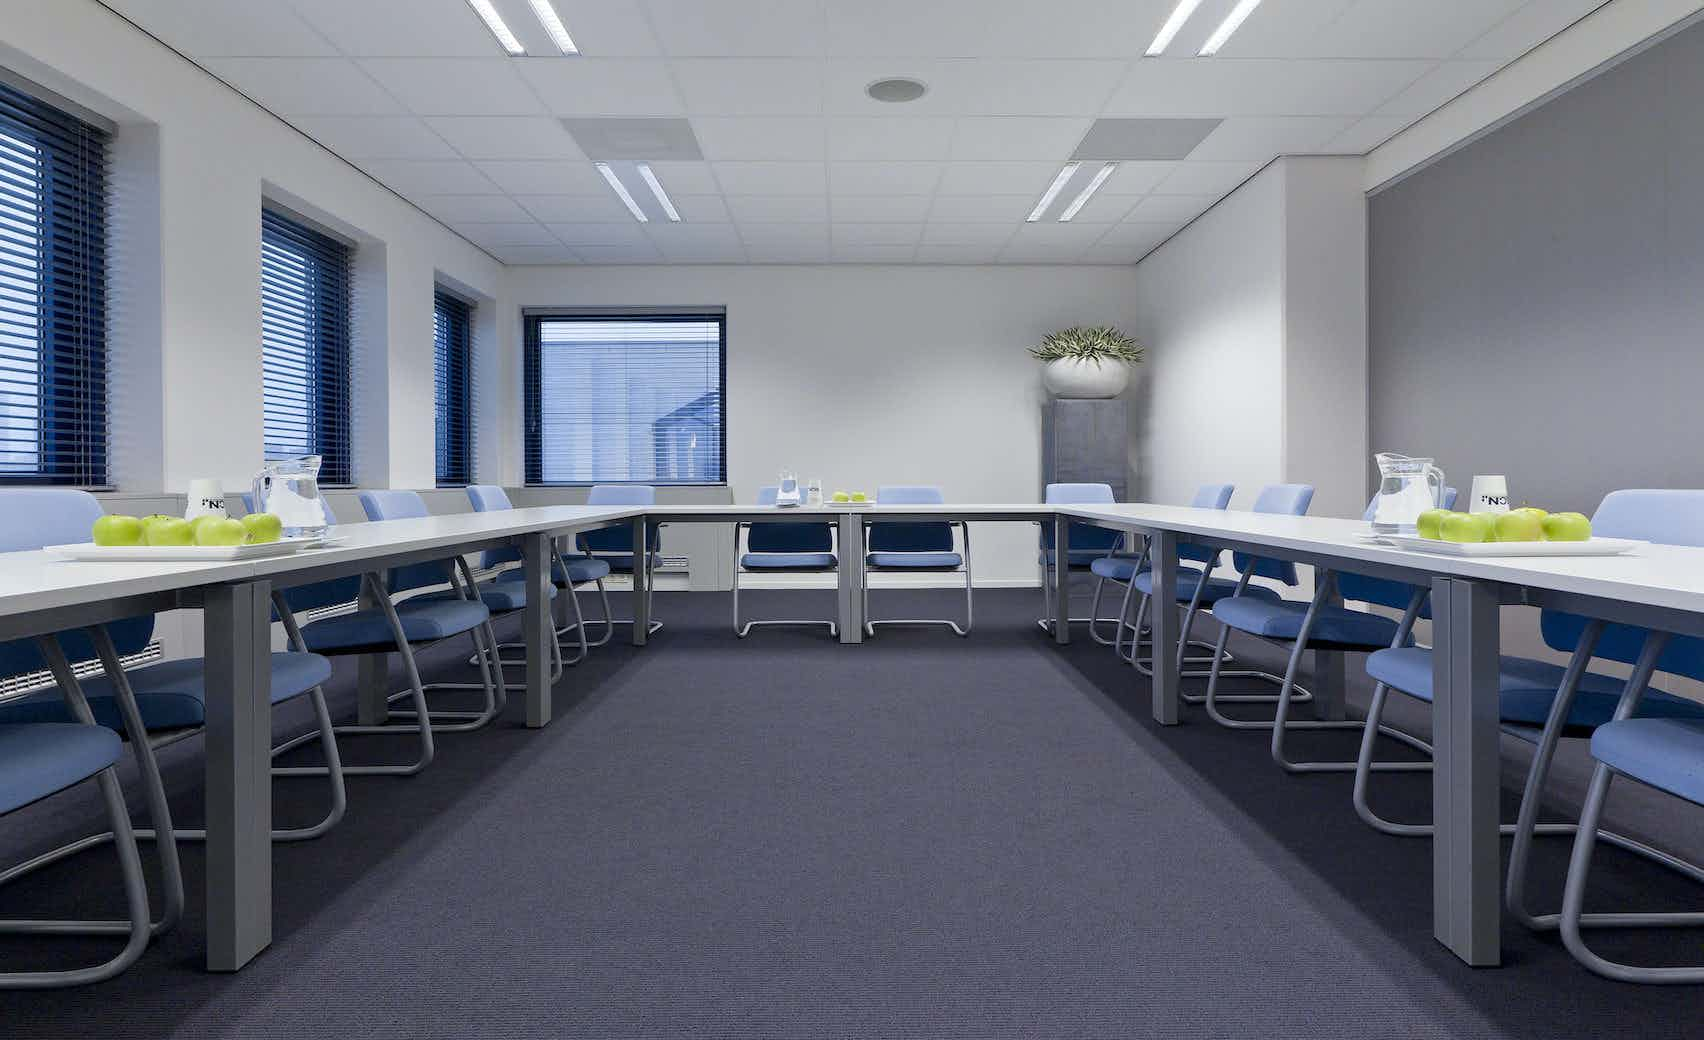 Room 1.2, BCN Utrecht Cantraal Station